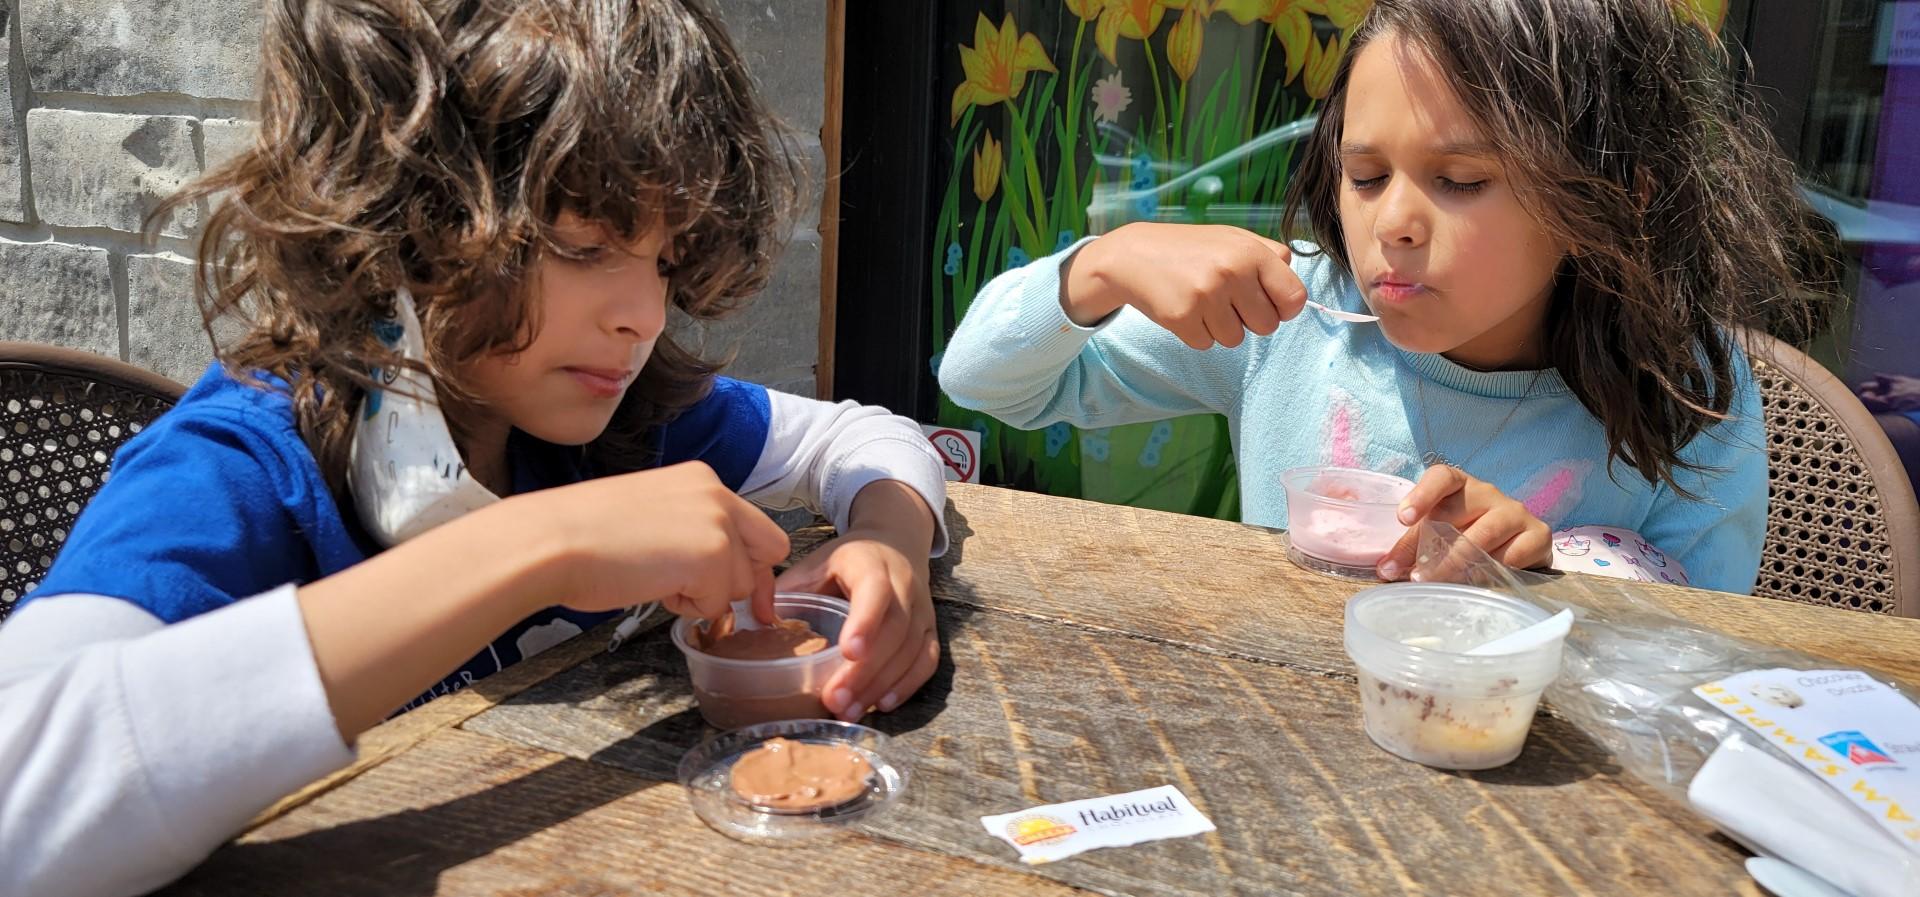 children eating ice cream outdoors